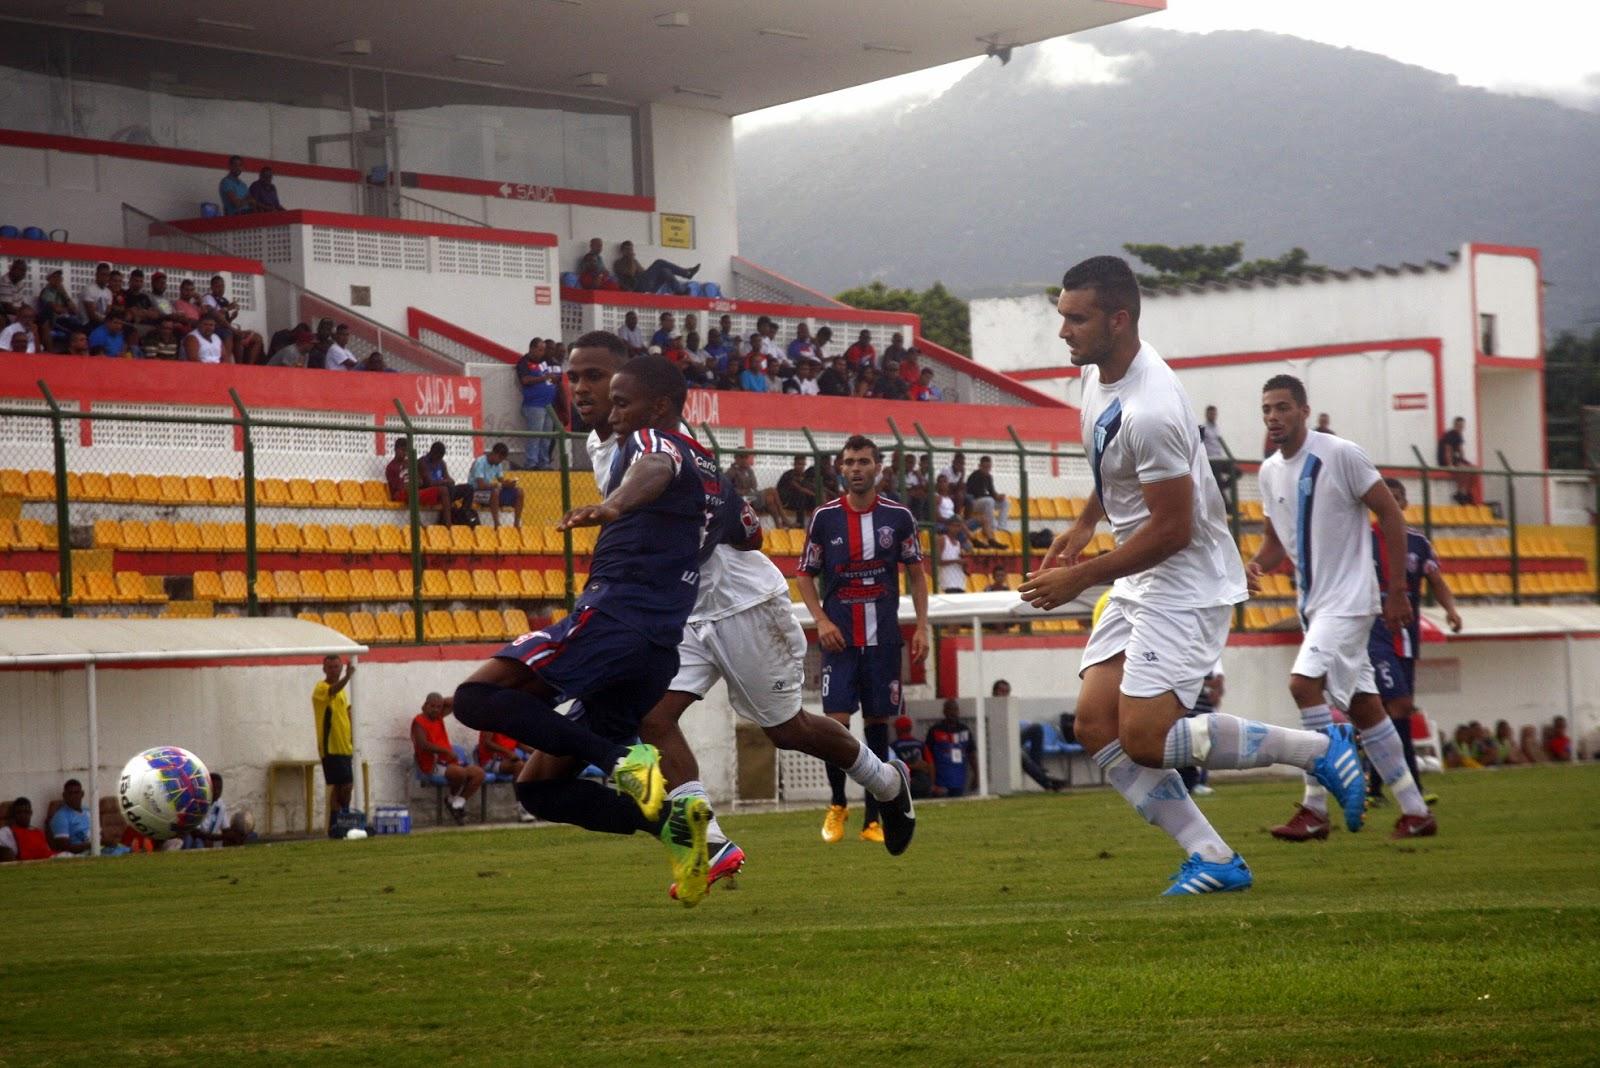 Pelotas fará seletiva de Futebol Feminino neste domingo